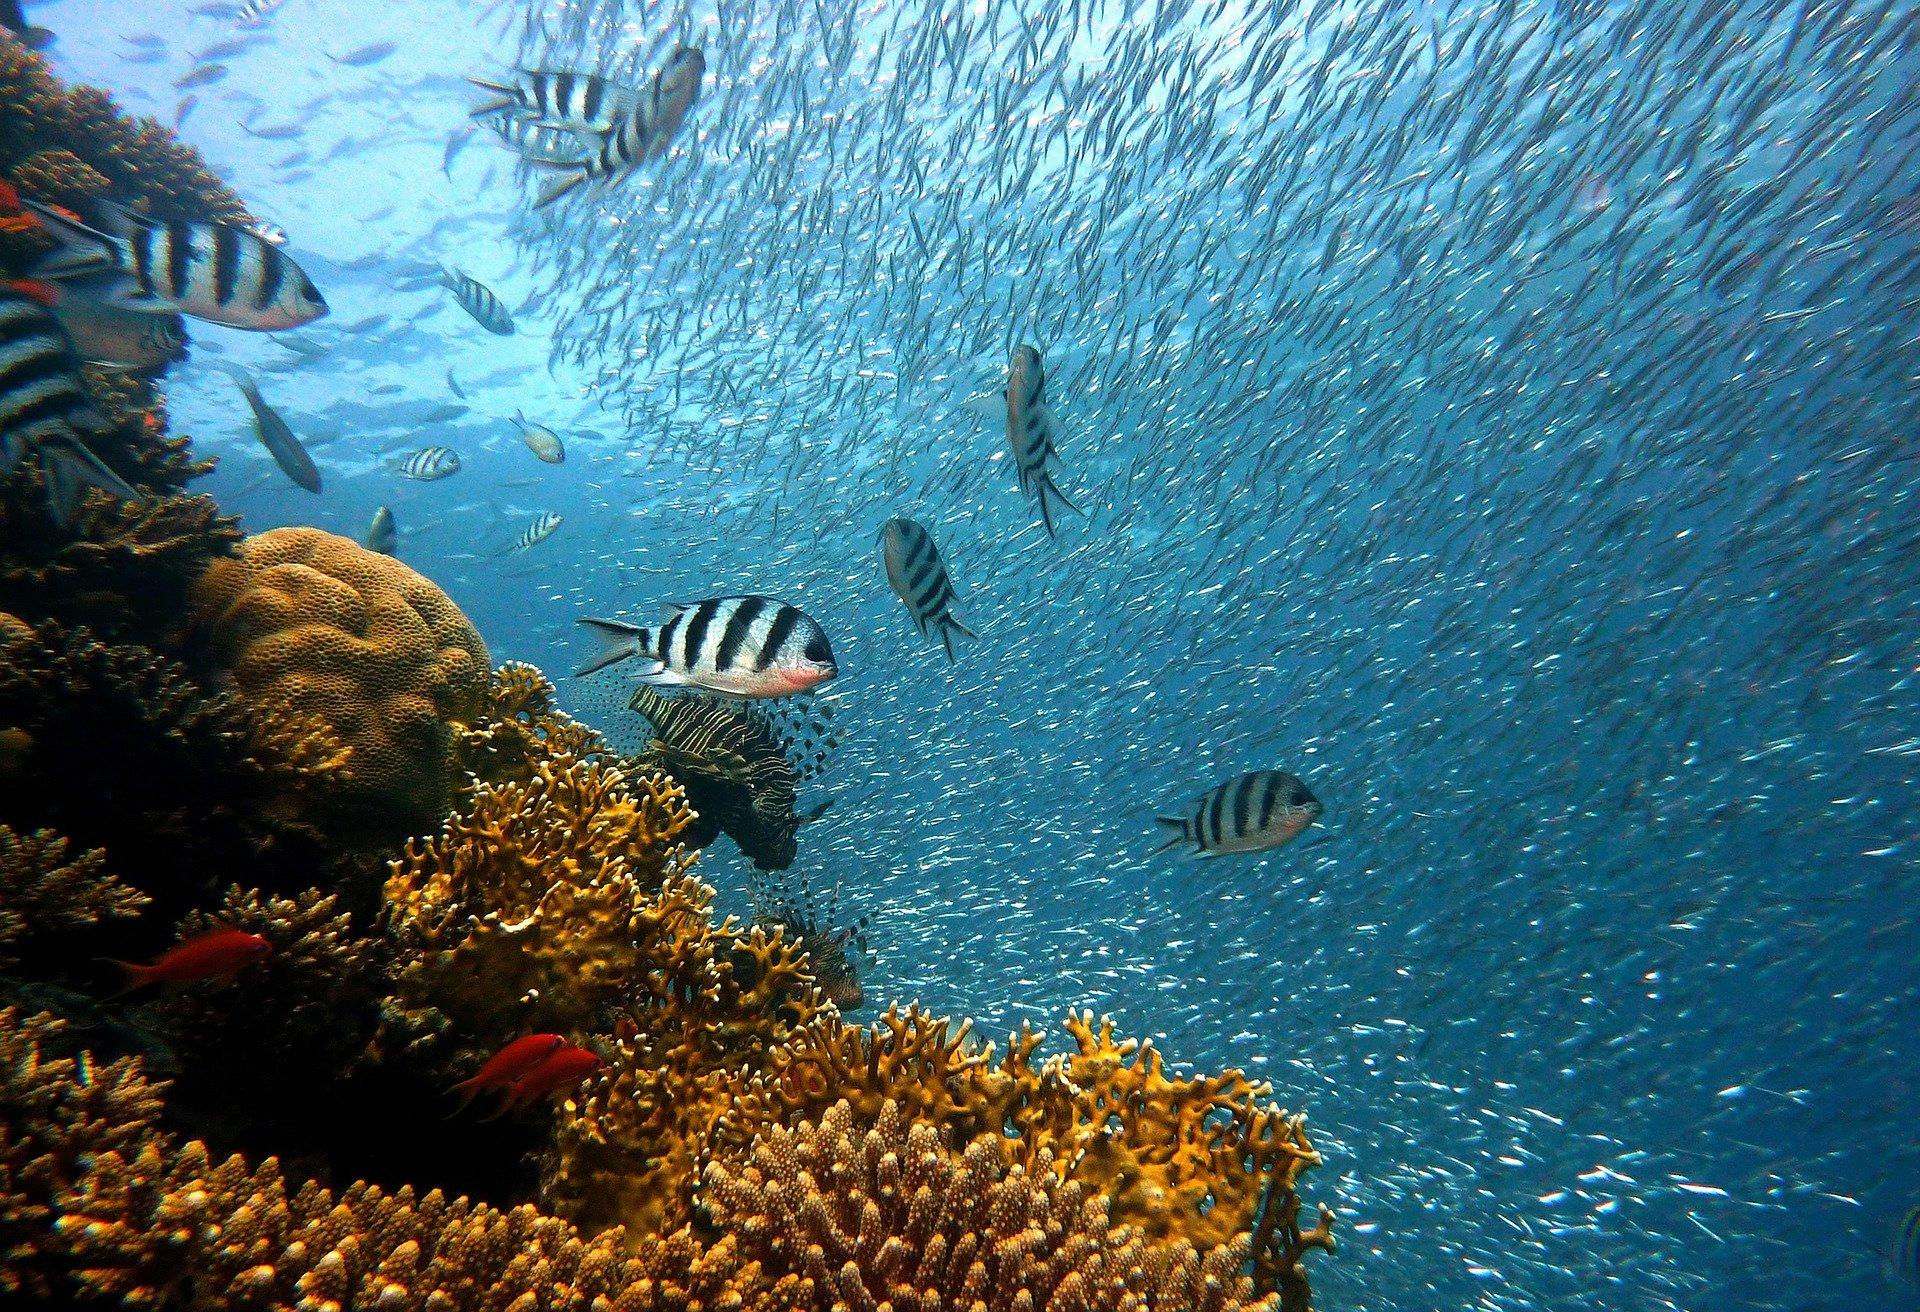 coral reef image